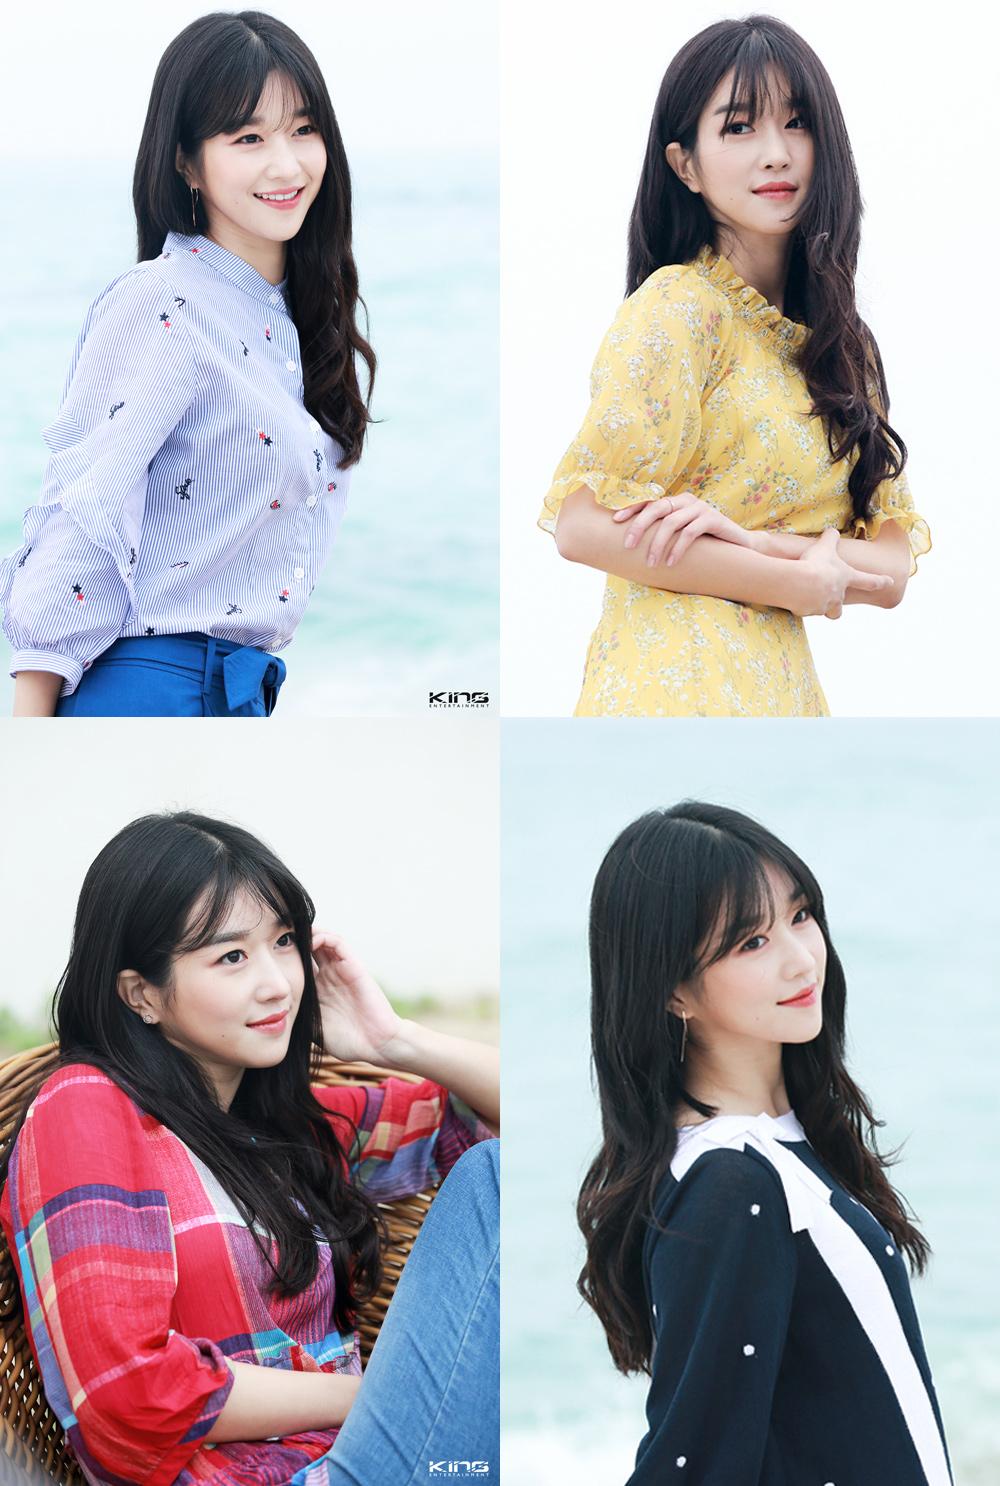 seo yeji actress, seo yeji profile, seo yeji photoshoot